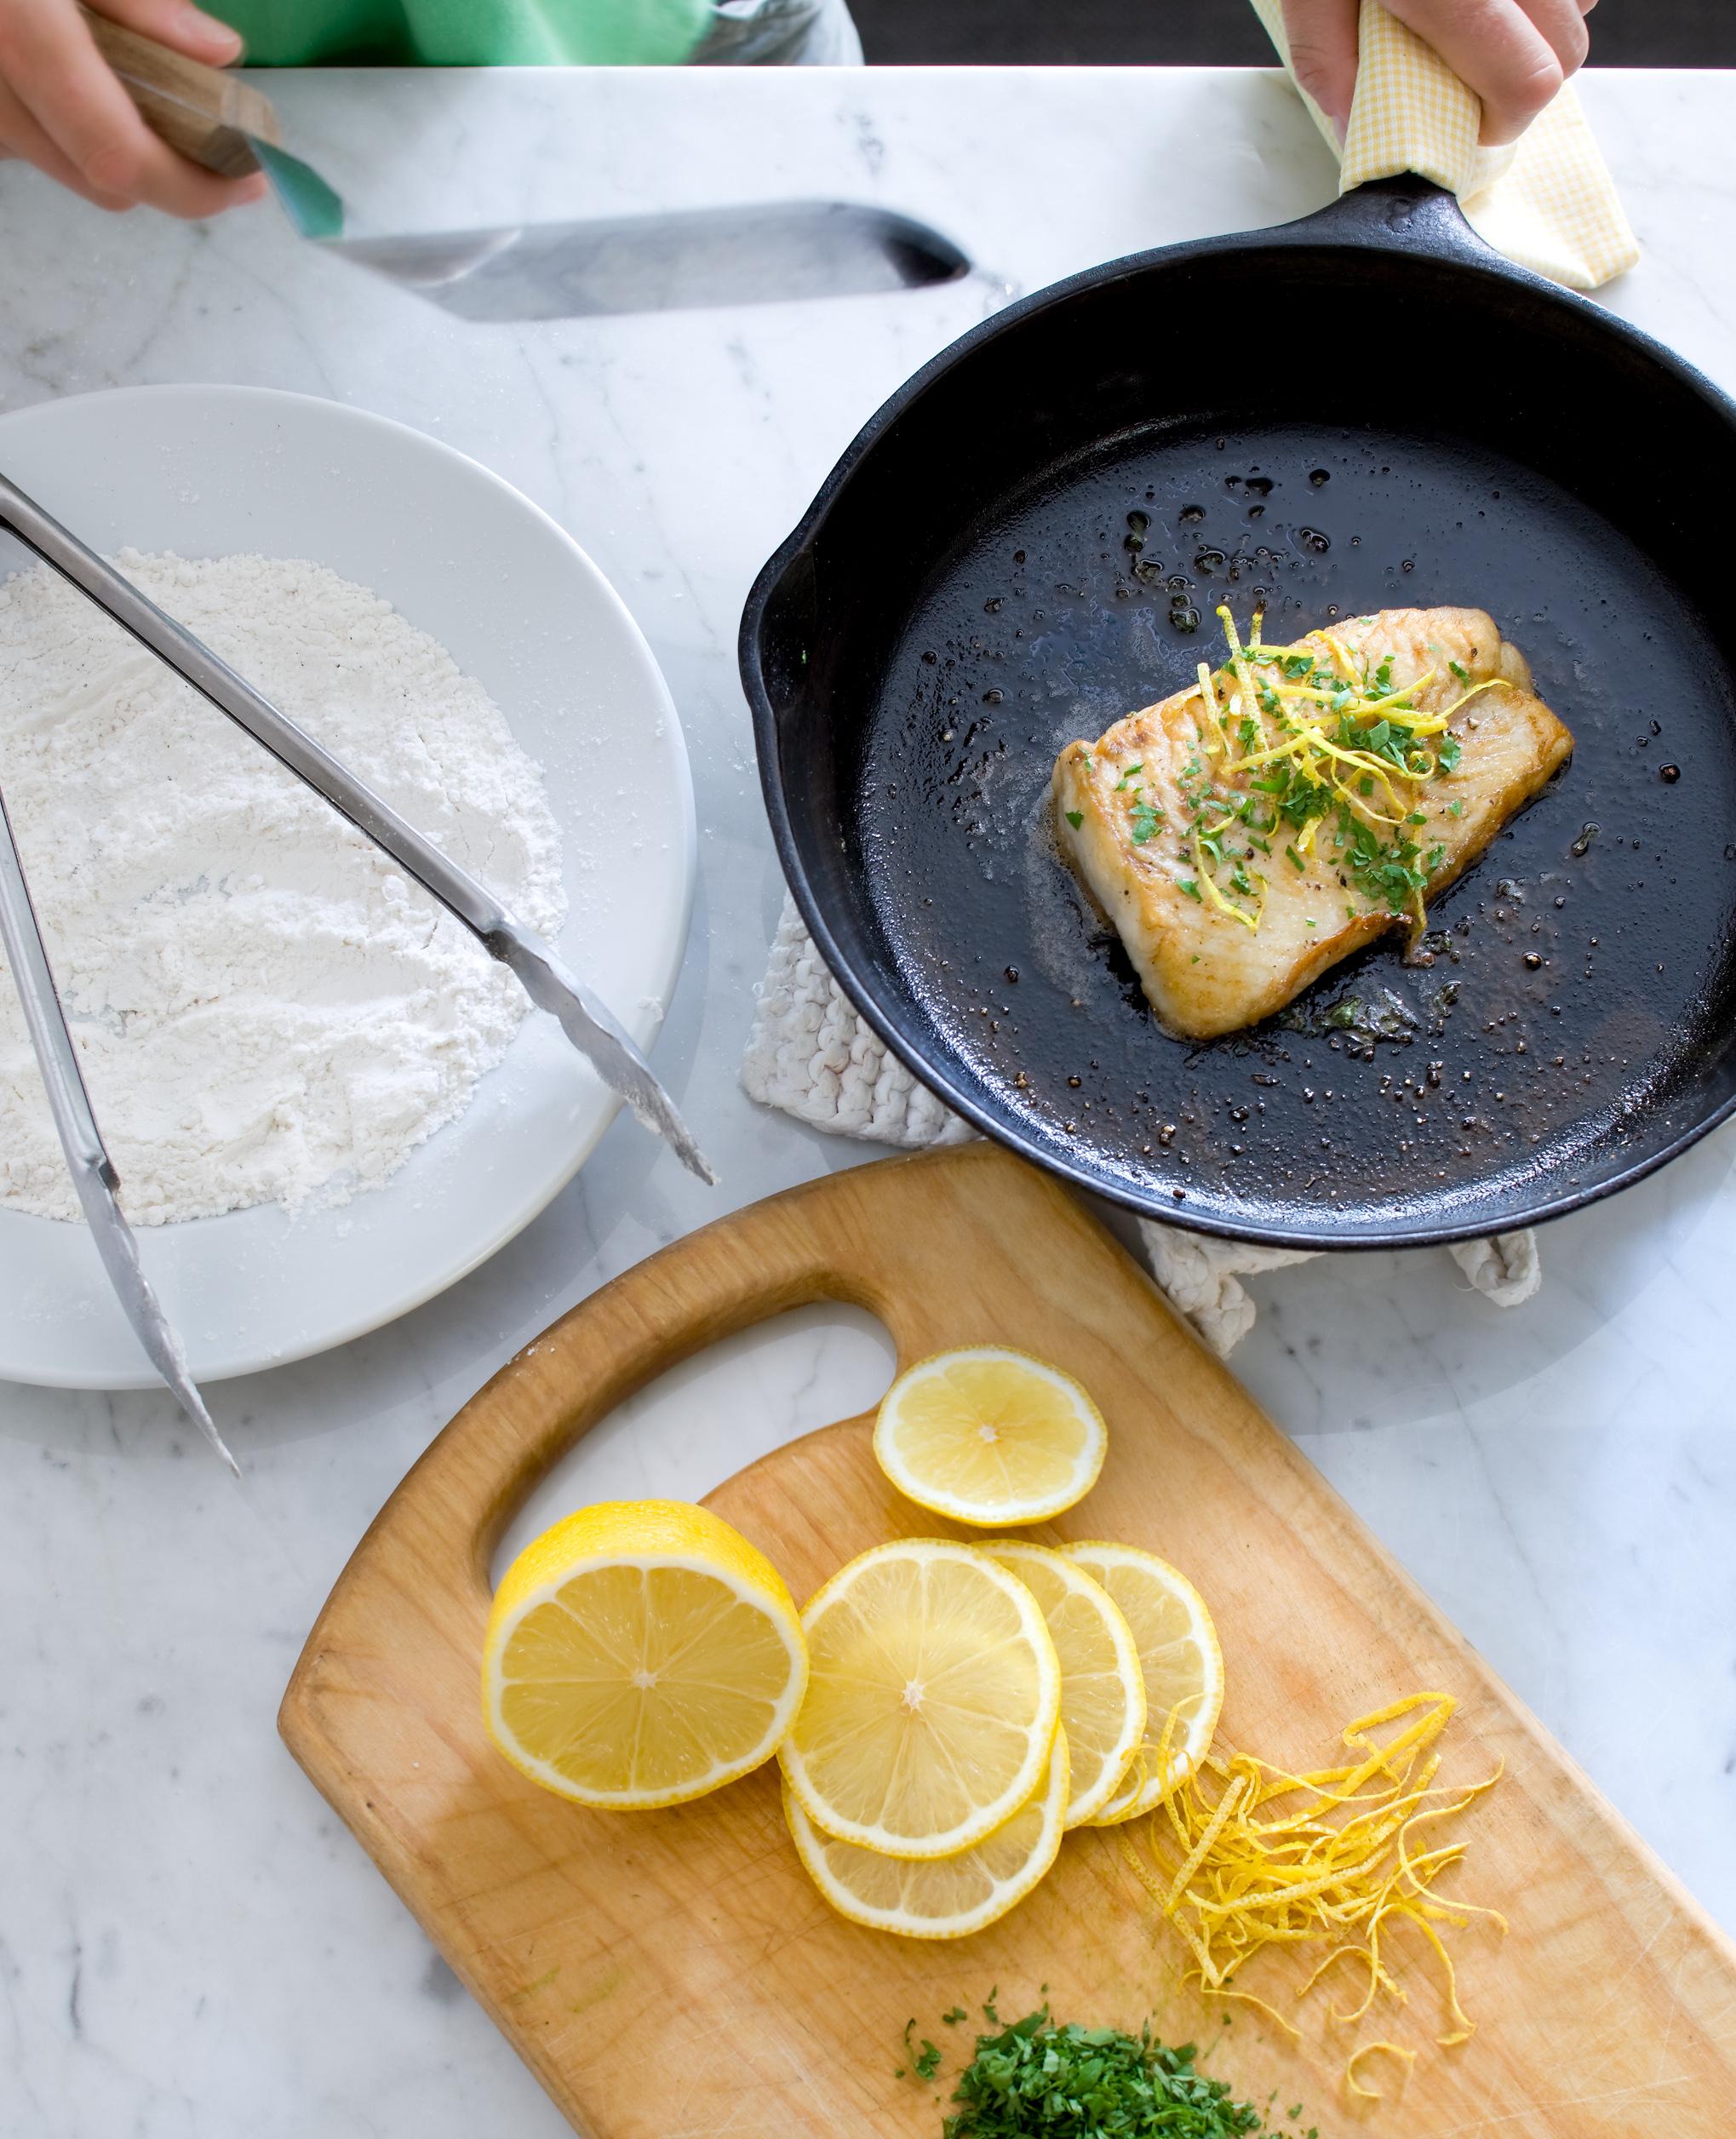 Lemon sole, a simple dish for dinner